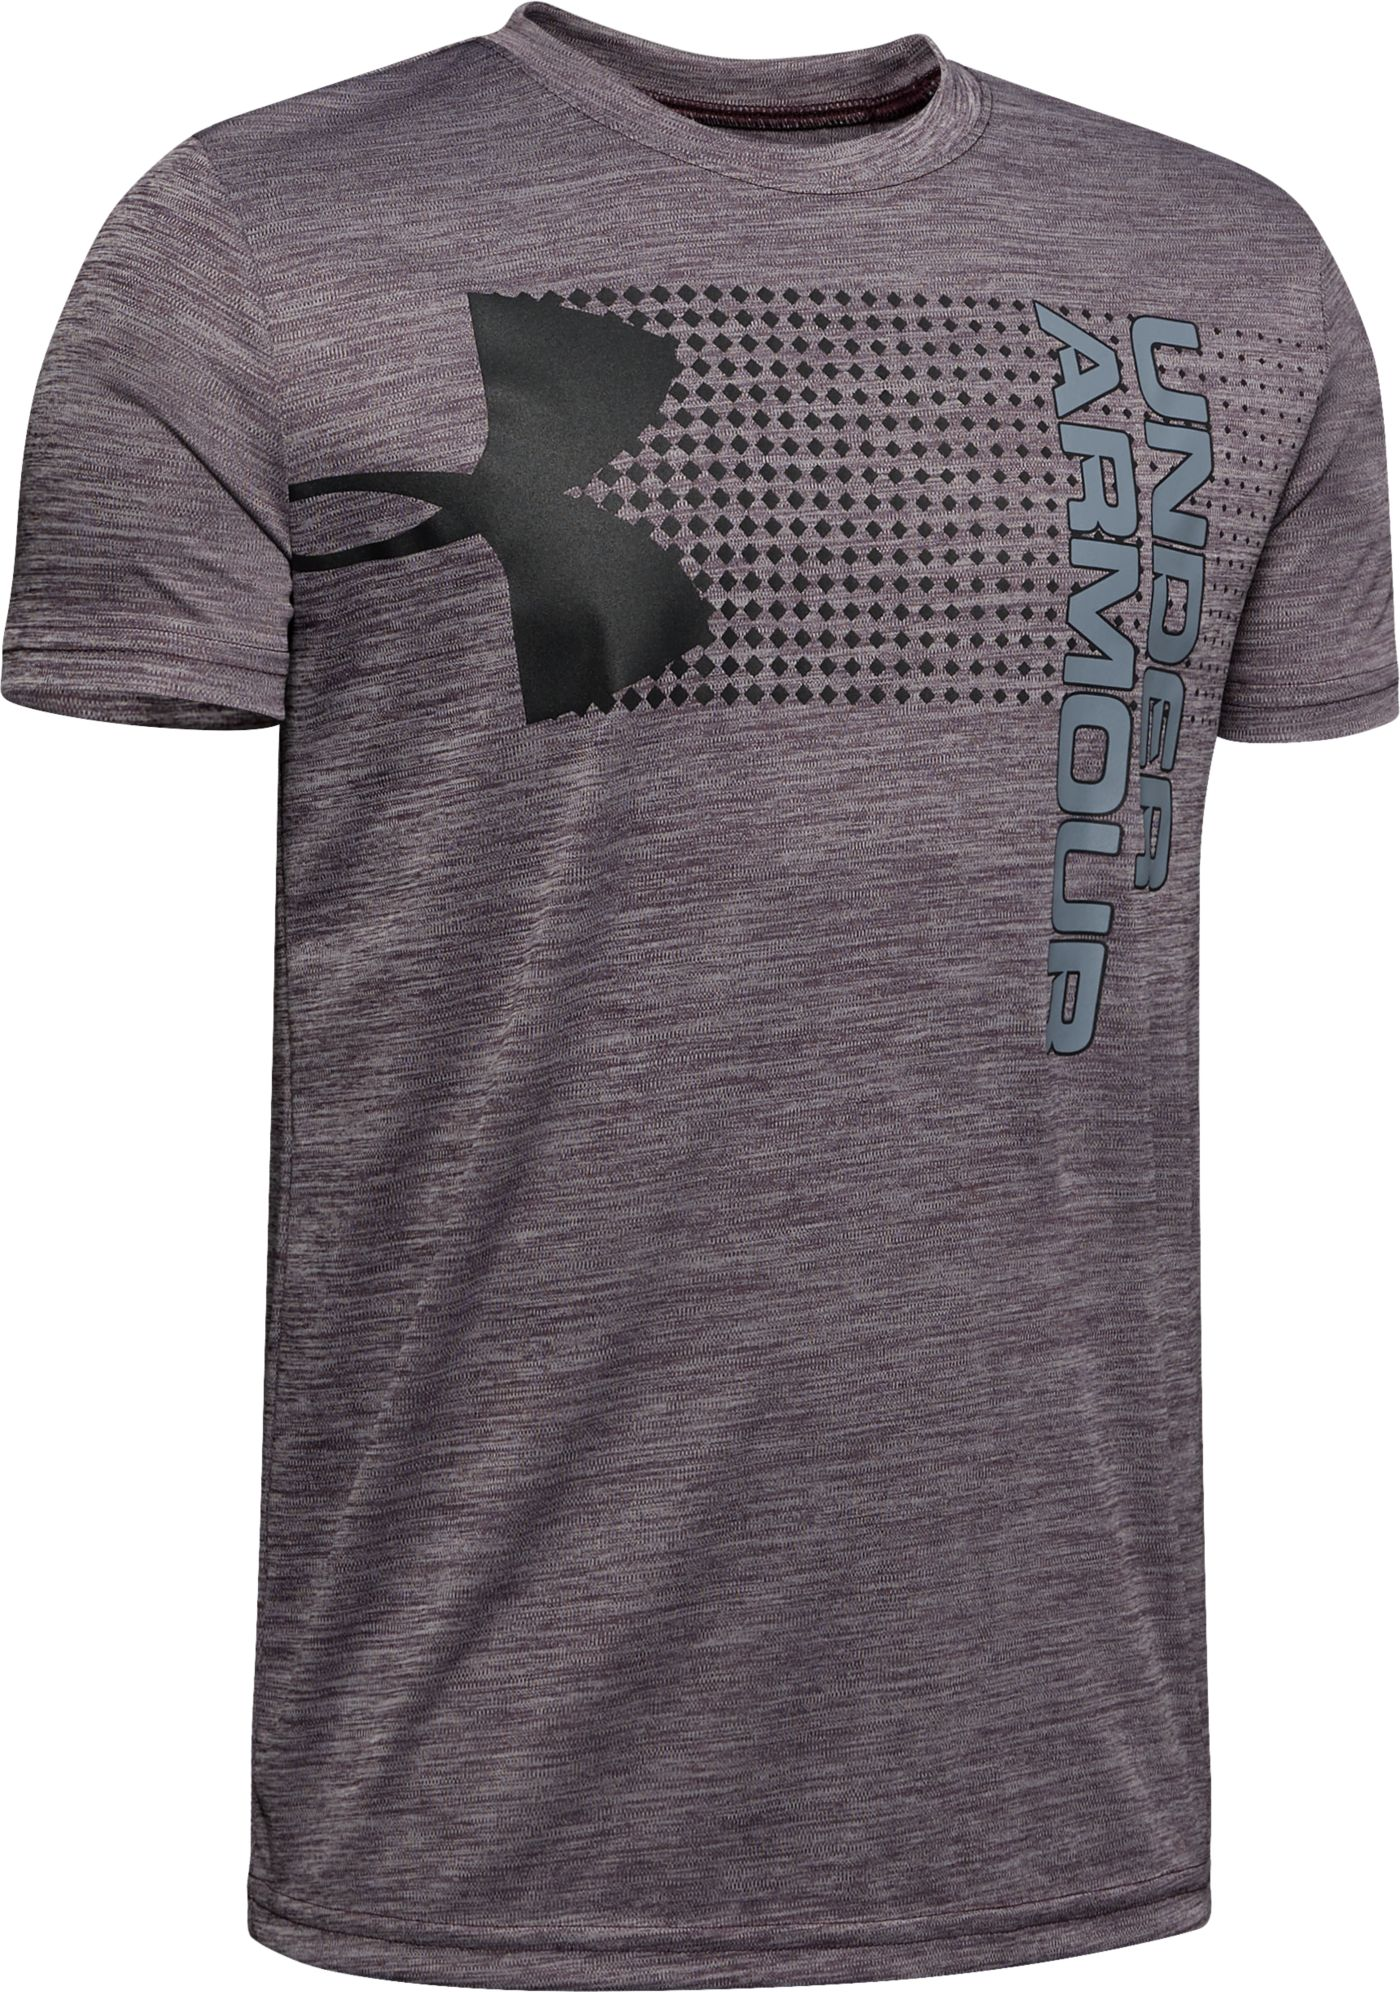 Under Armour Boys' Crossfade T-Shirt 1